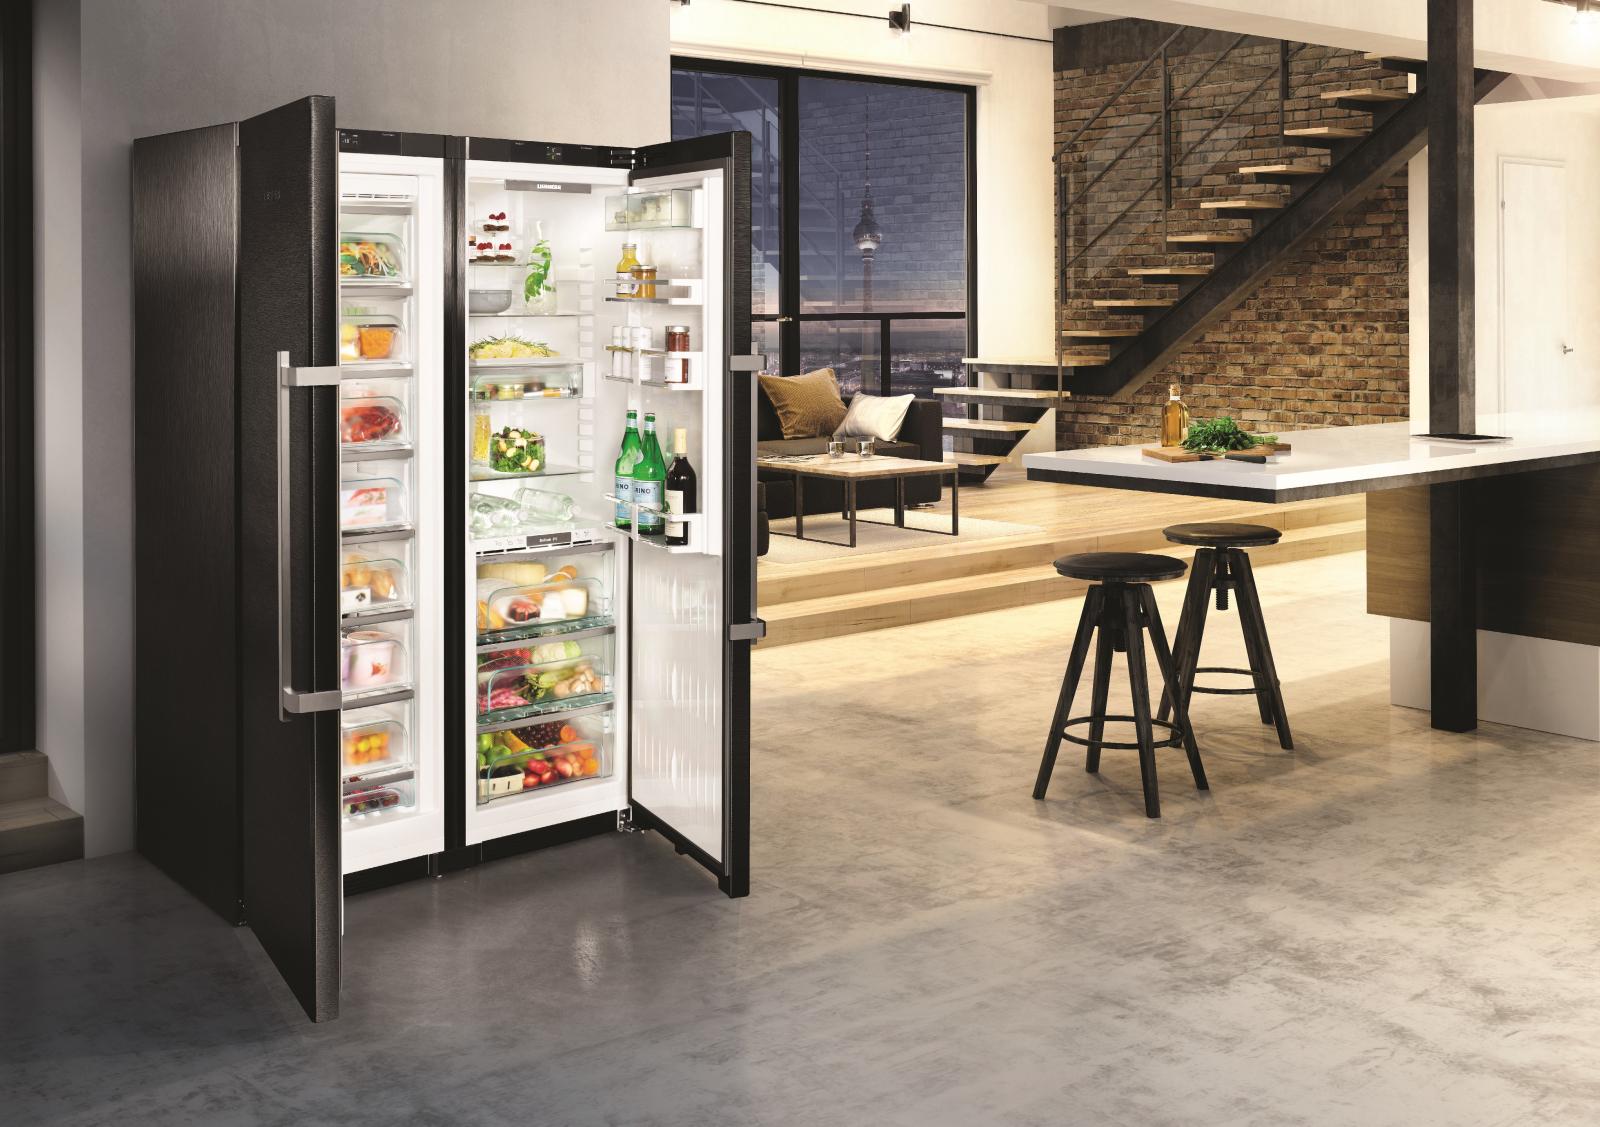 купить Side-by-Side холодильник Liebherr SBSbs 8673 Украина фото 7